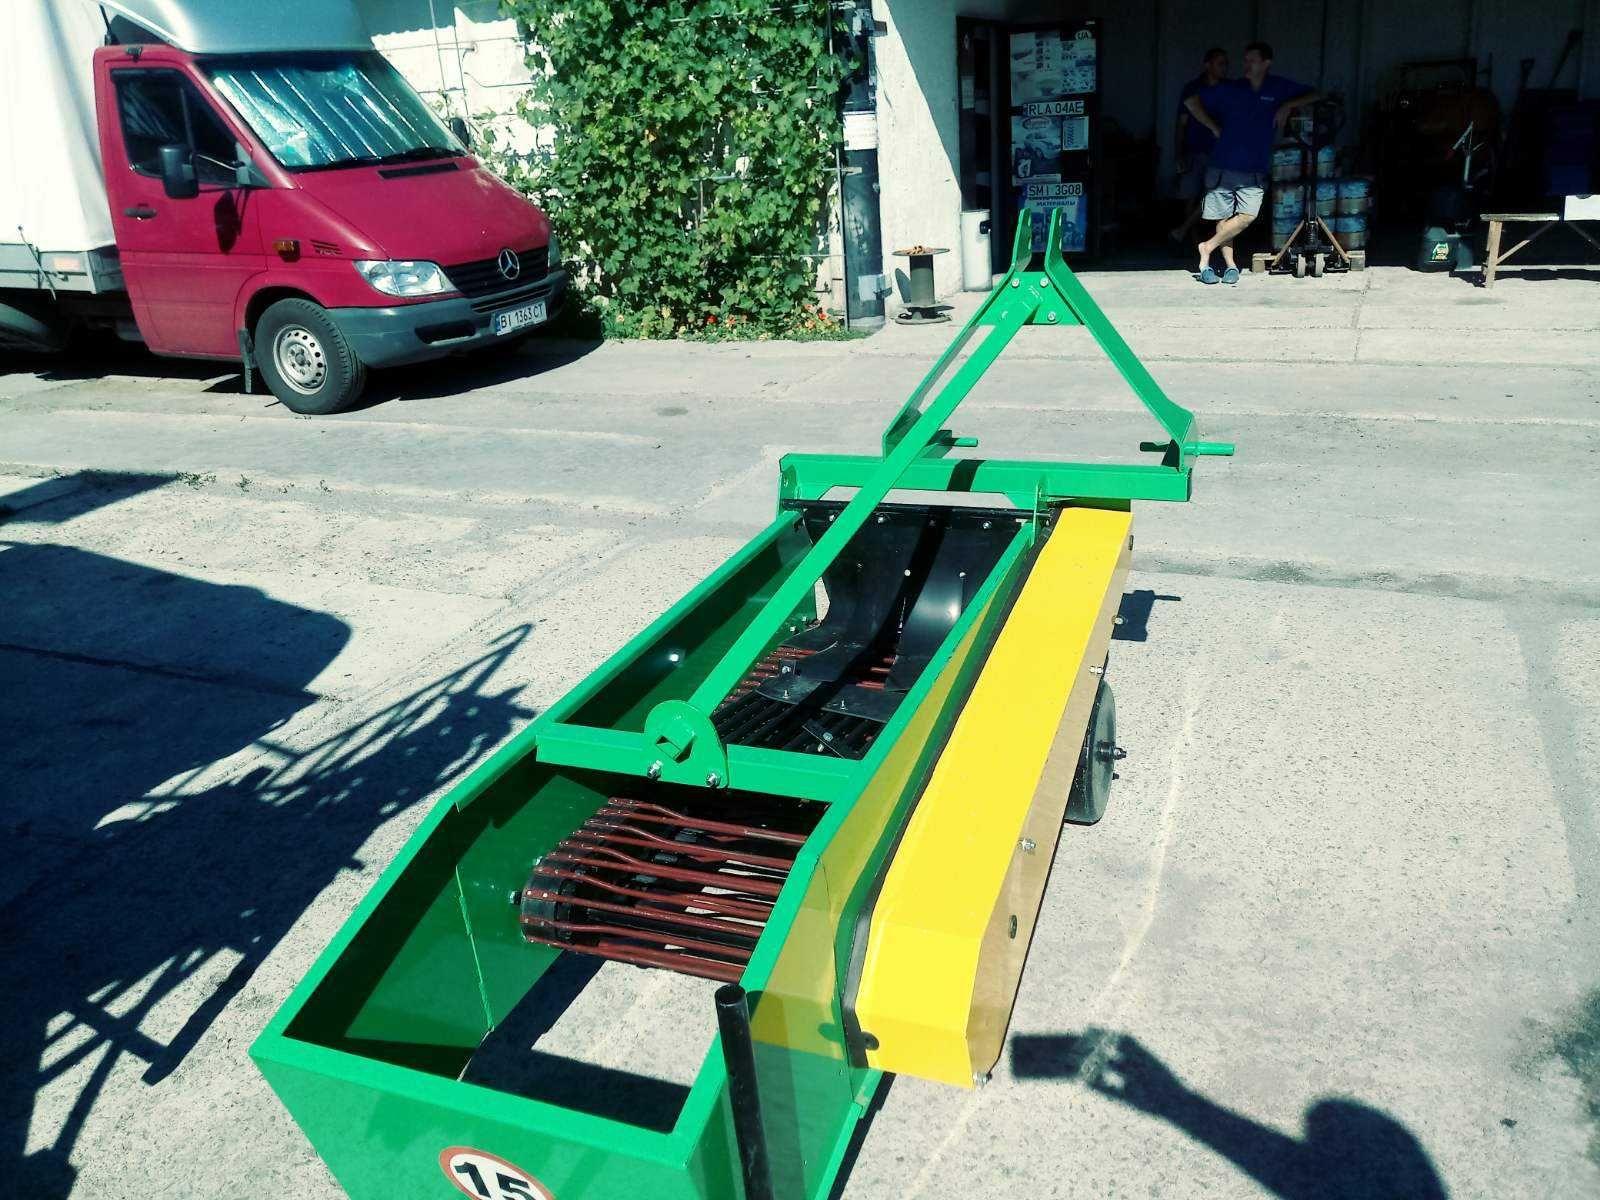 картофелекопатель Wirax  Bomet картоплекопач